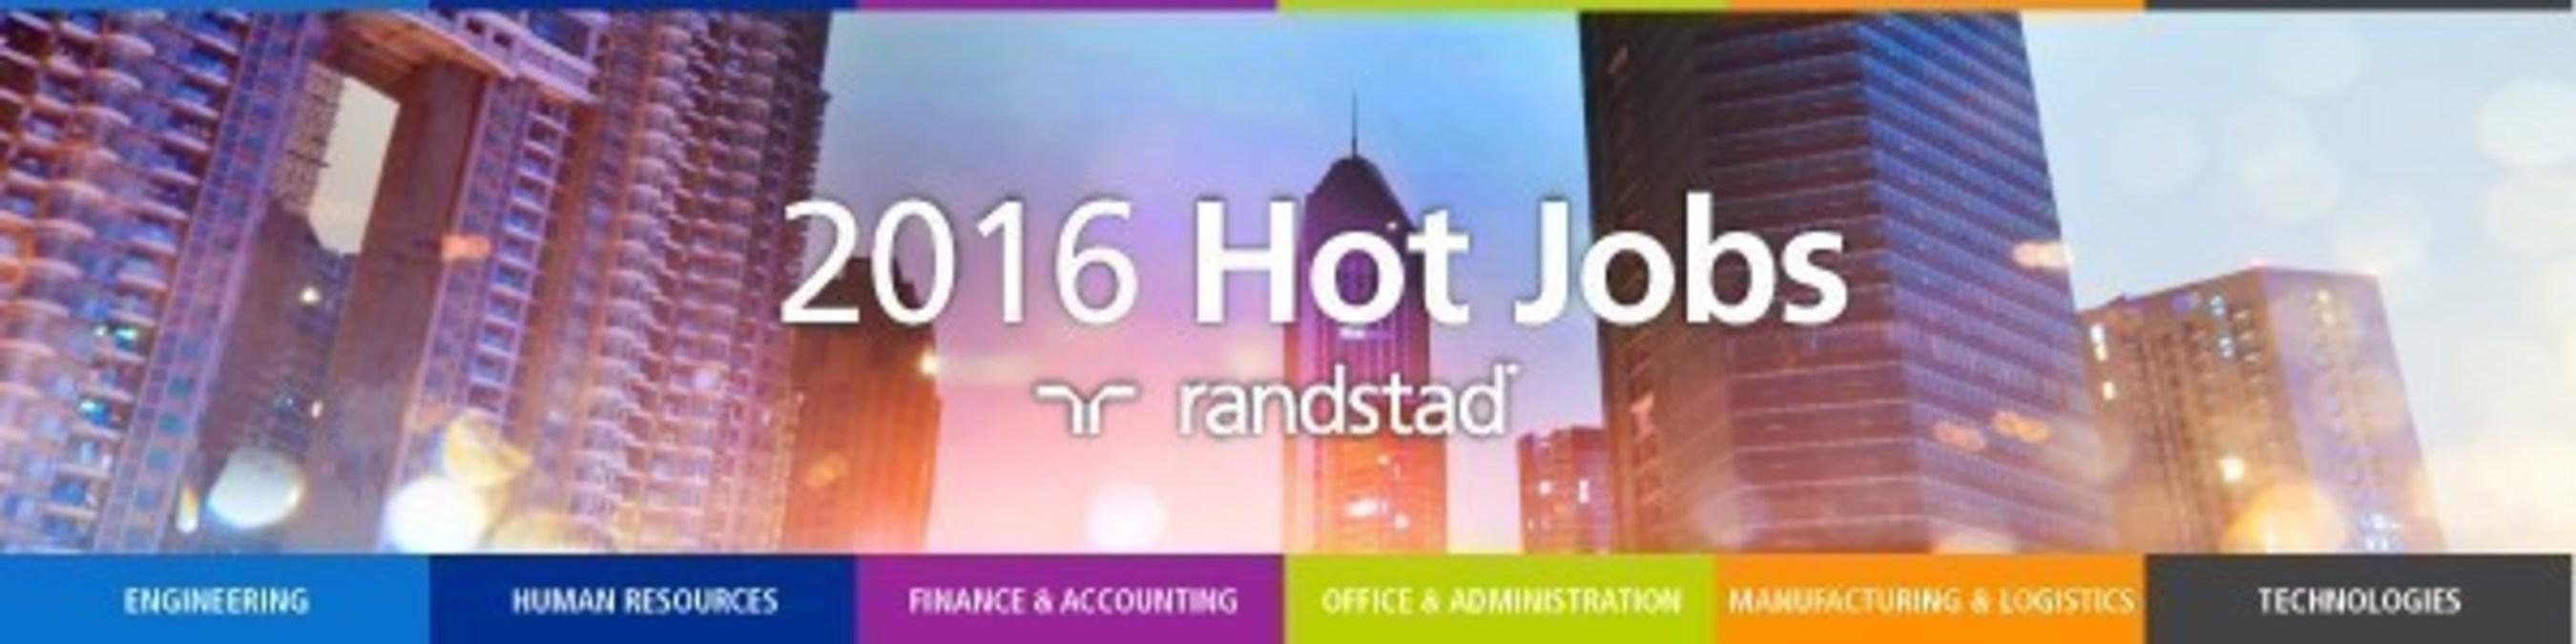 Randstad US 2016 Hot Jobs